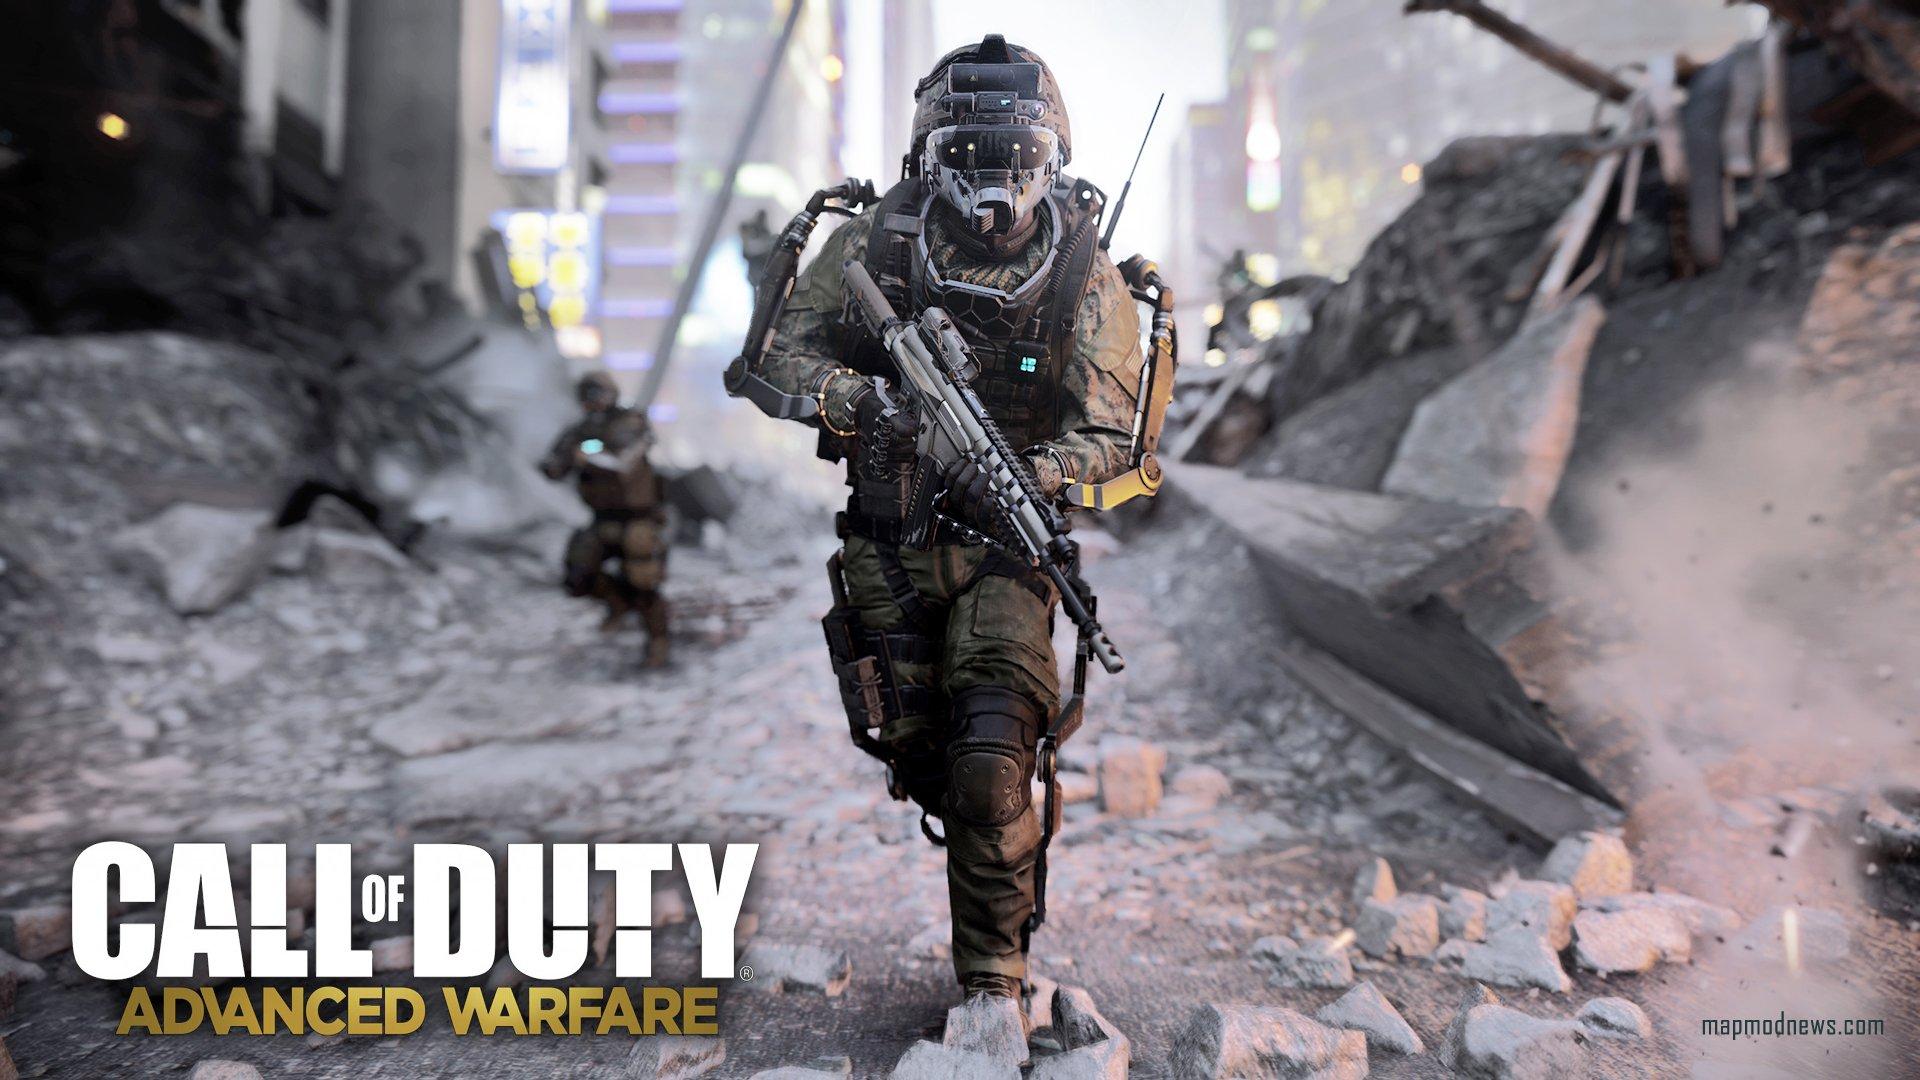 Call of Duty Advanced Warfare. Старая игра на новый лад - Изображение 1